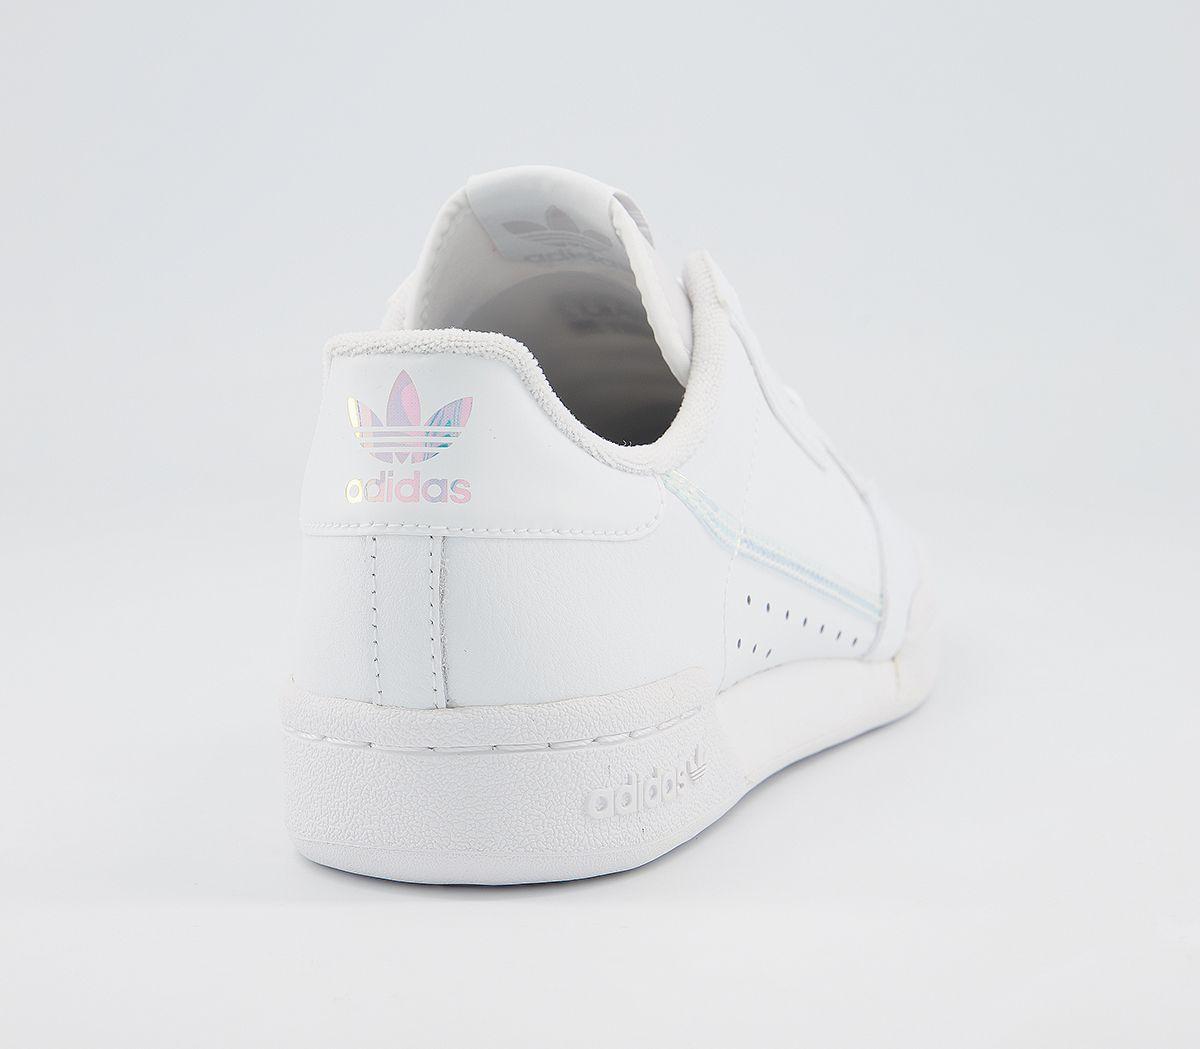 Bambini-Adidas-Continental-anni-039-80-JNR-Scarpe-da-ginnastica-bianco-iridescente-Kids miniatura 3